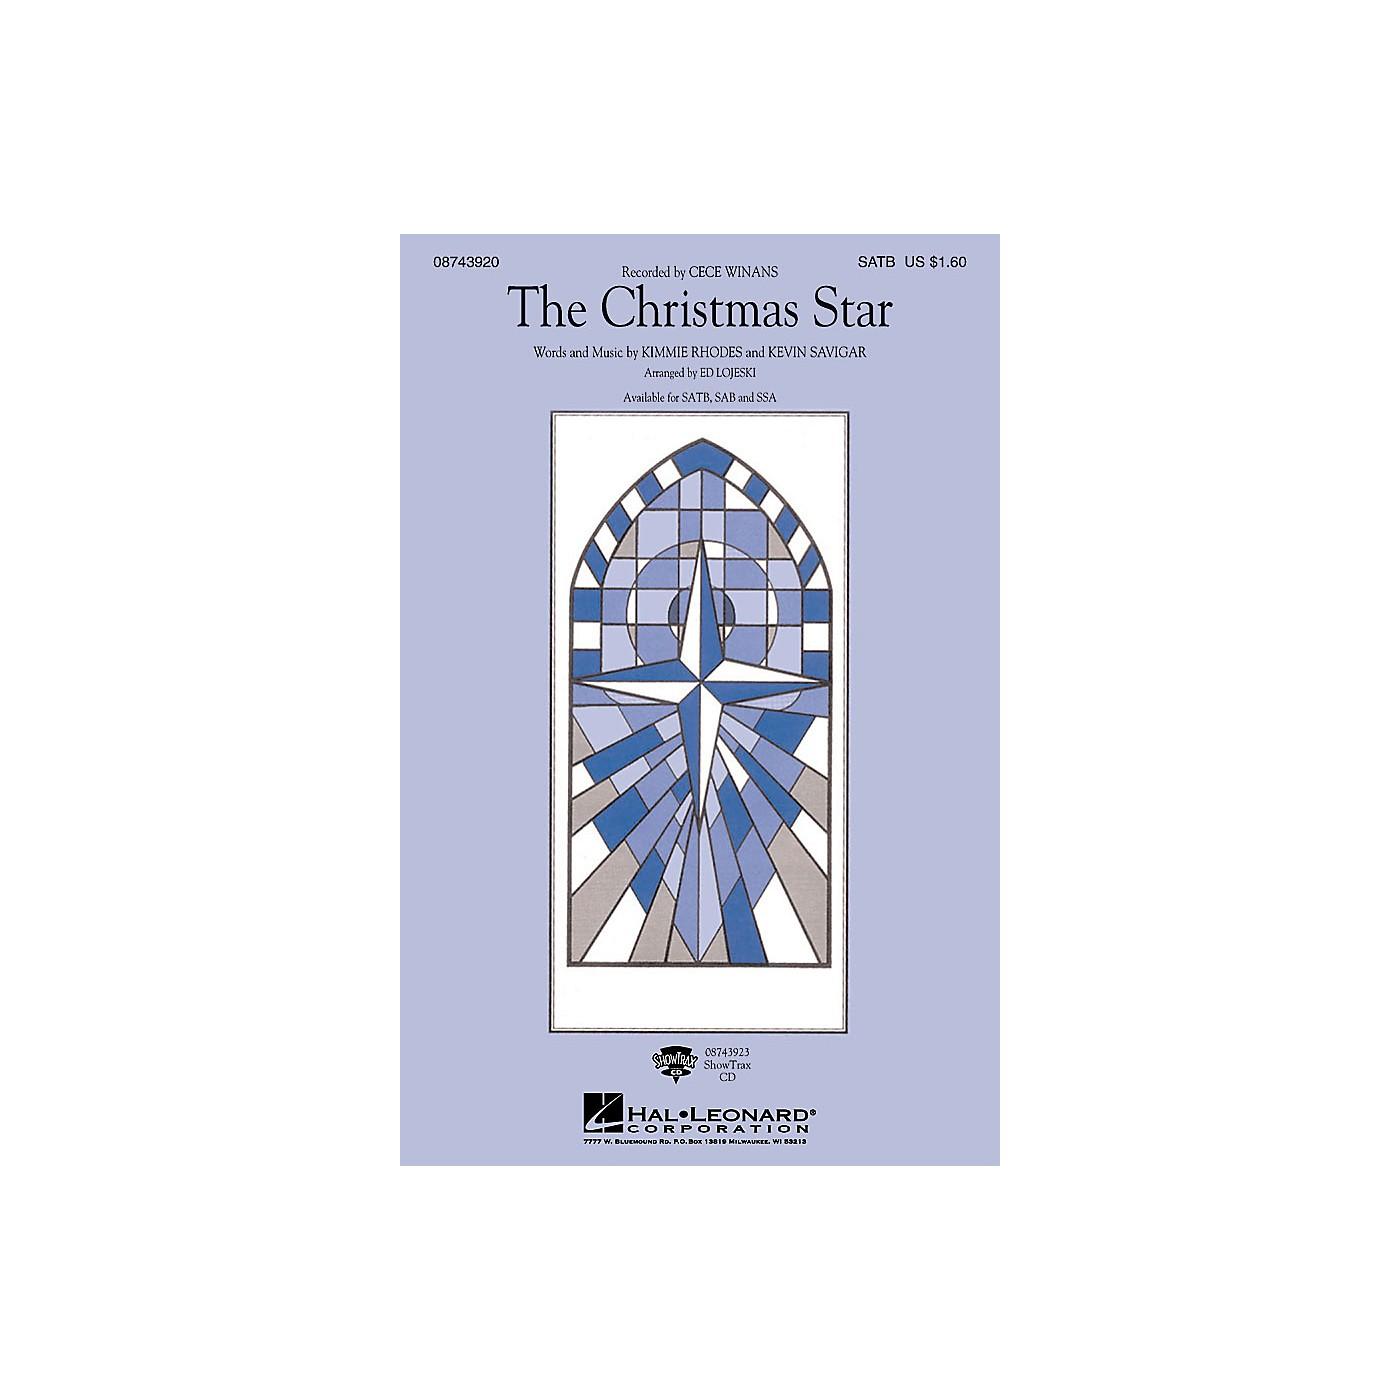 Hal Leonard The Christmas Star SATB by CeCe Winans arranged by Ed Lojeski thumbnail